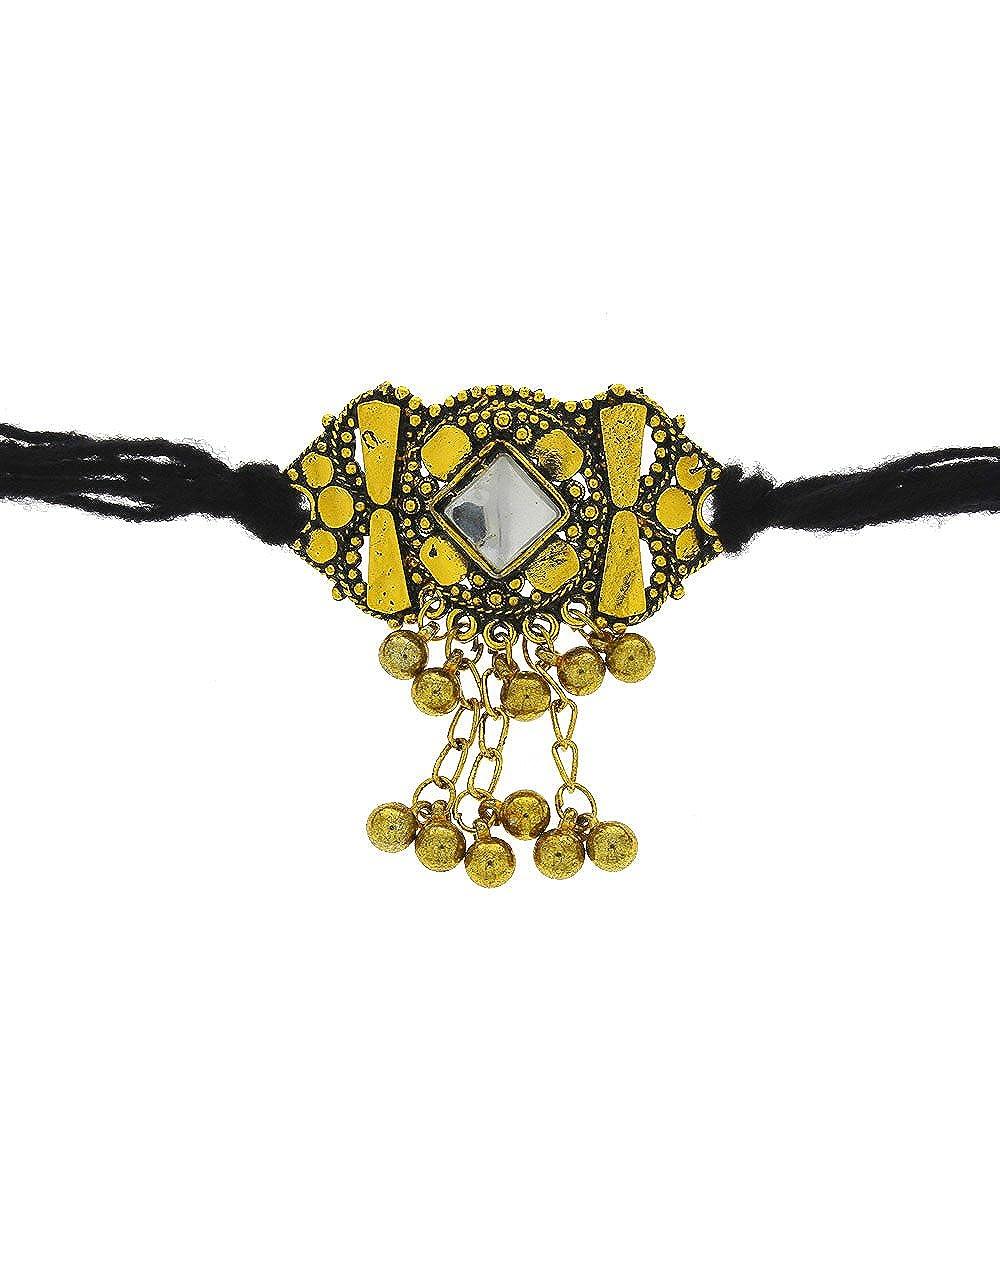 Anuradha Art Golden Finish Studded Sparkling Stone Bajuband//Armlets for Women//Girls